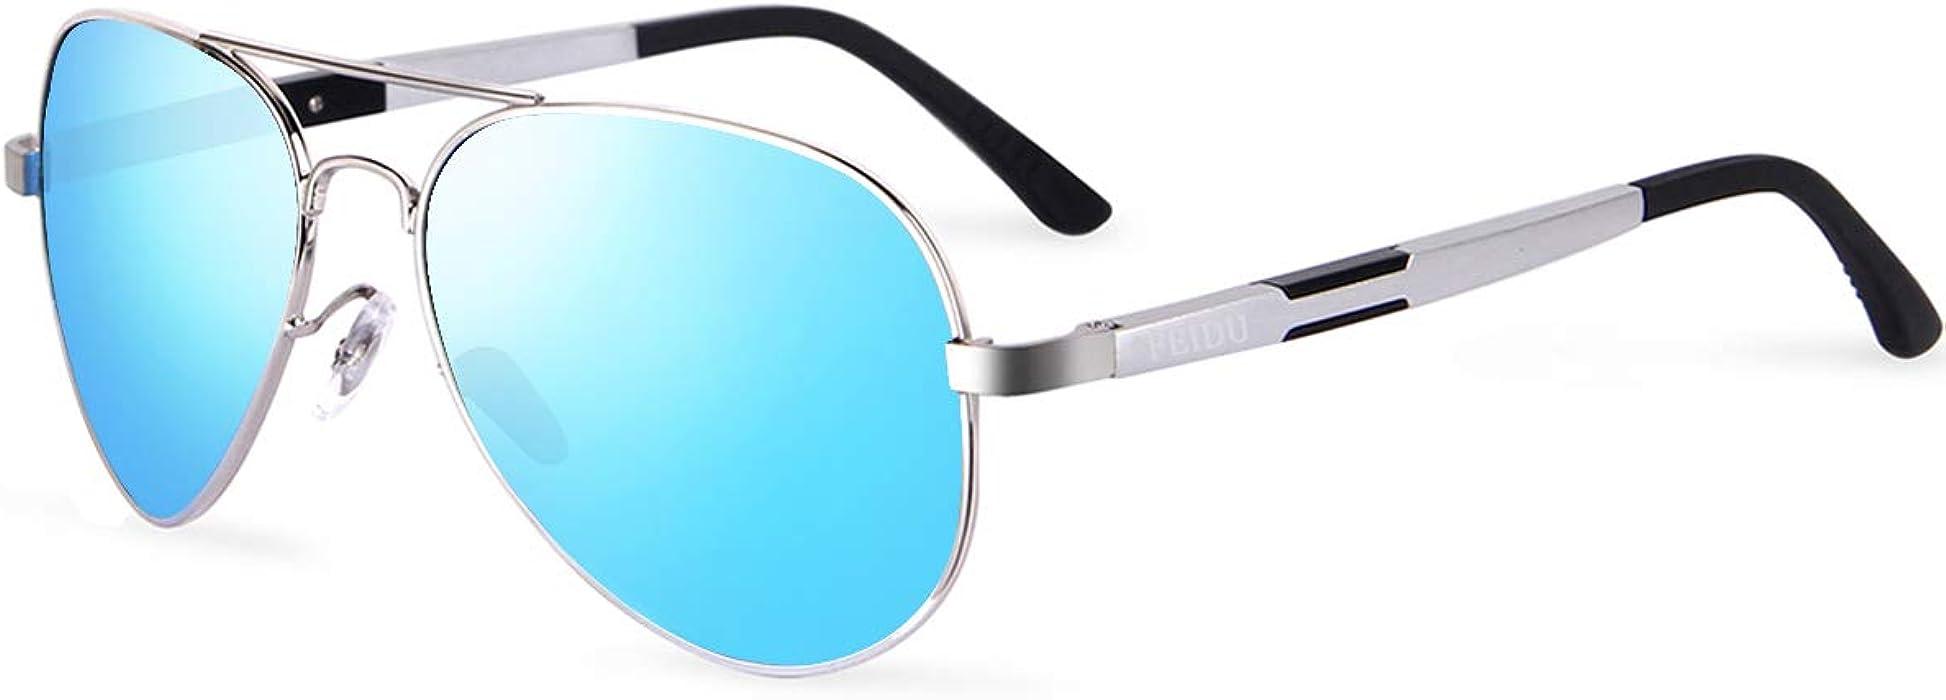 7b8c0ca2c86df FEIDU Mens Polarized Aviator Sunglasses Metal Frame Unisex Sun Glasses  FD9001